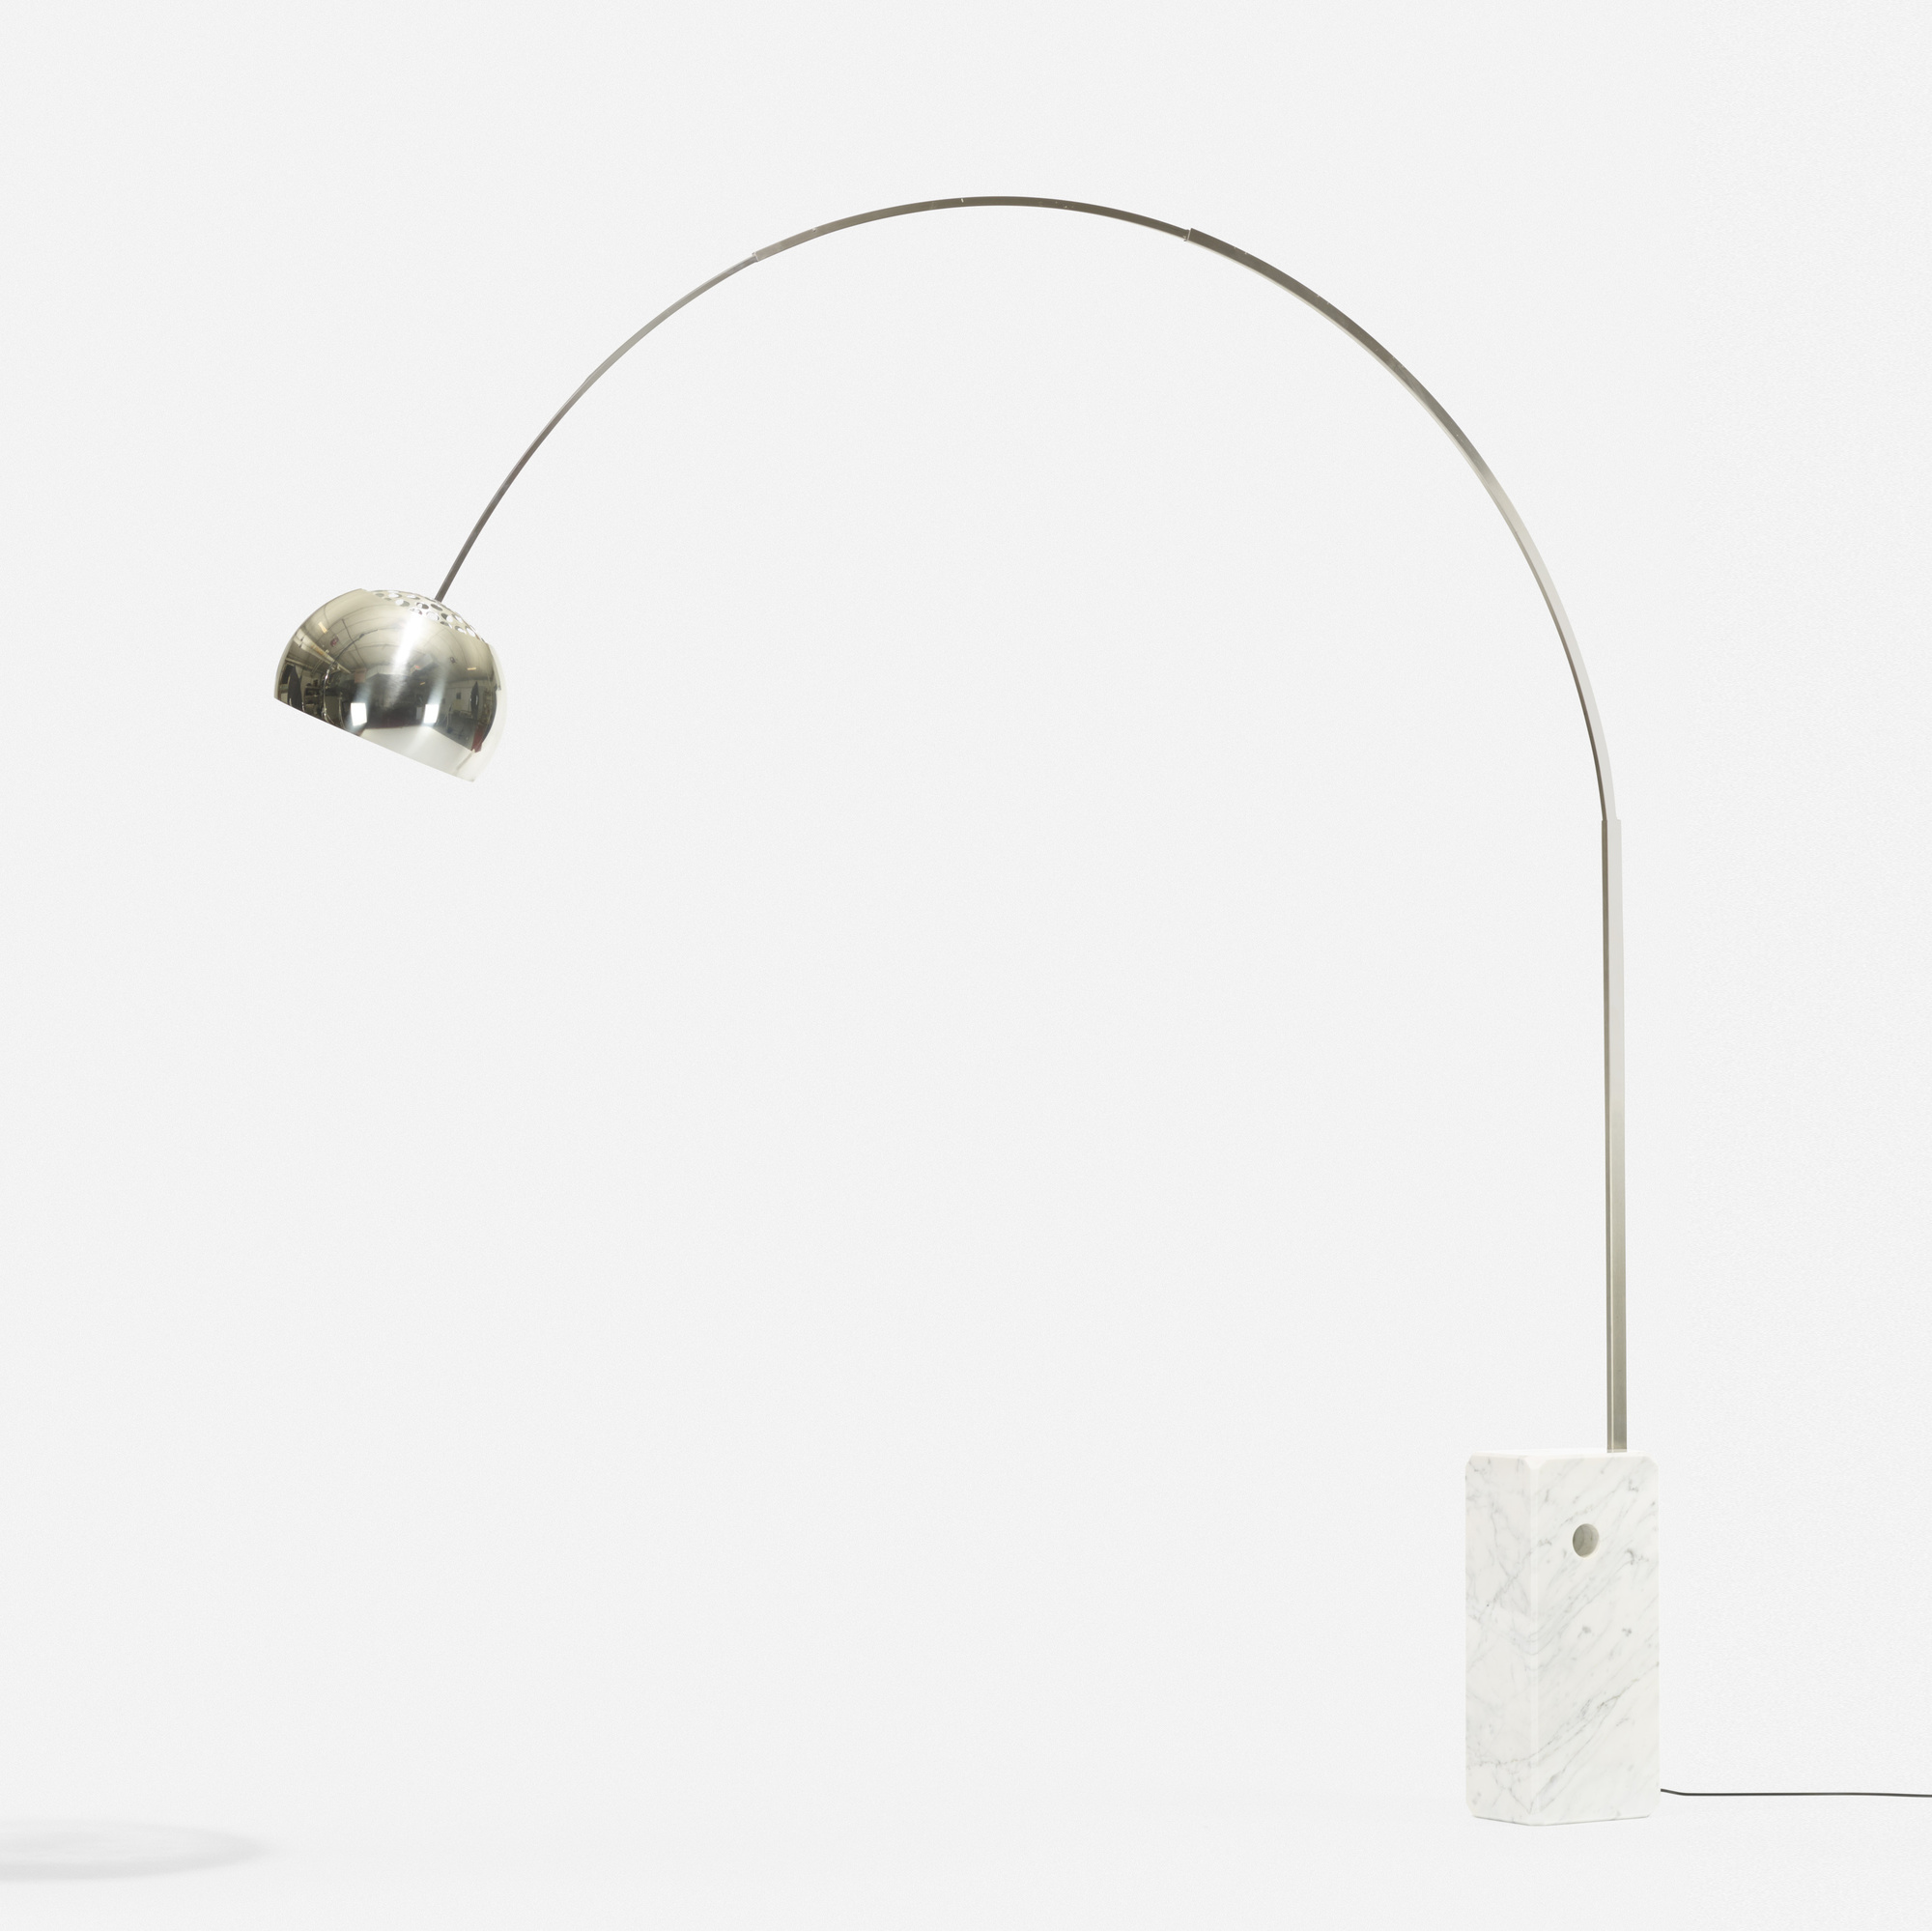 308: Achille and Pier Giacomo Castiglioni / Arco floor lamp (1 of 1)